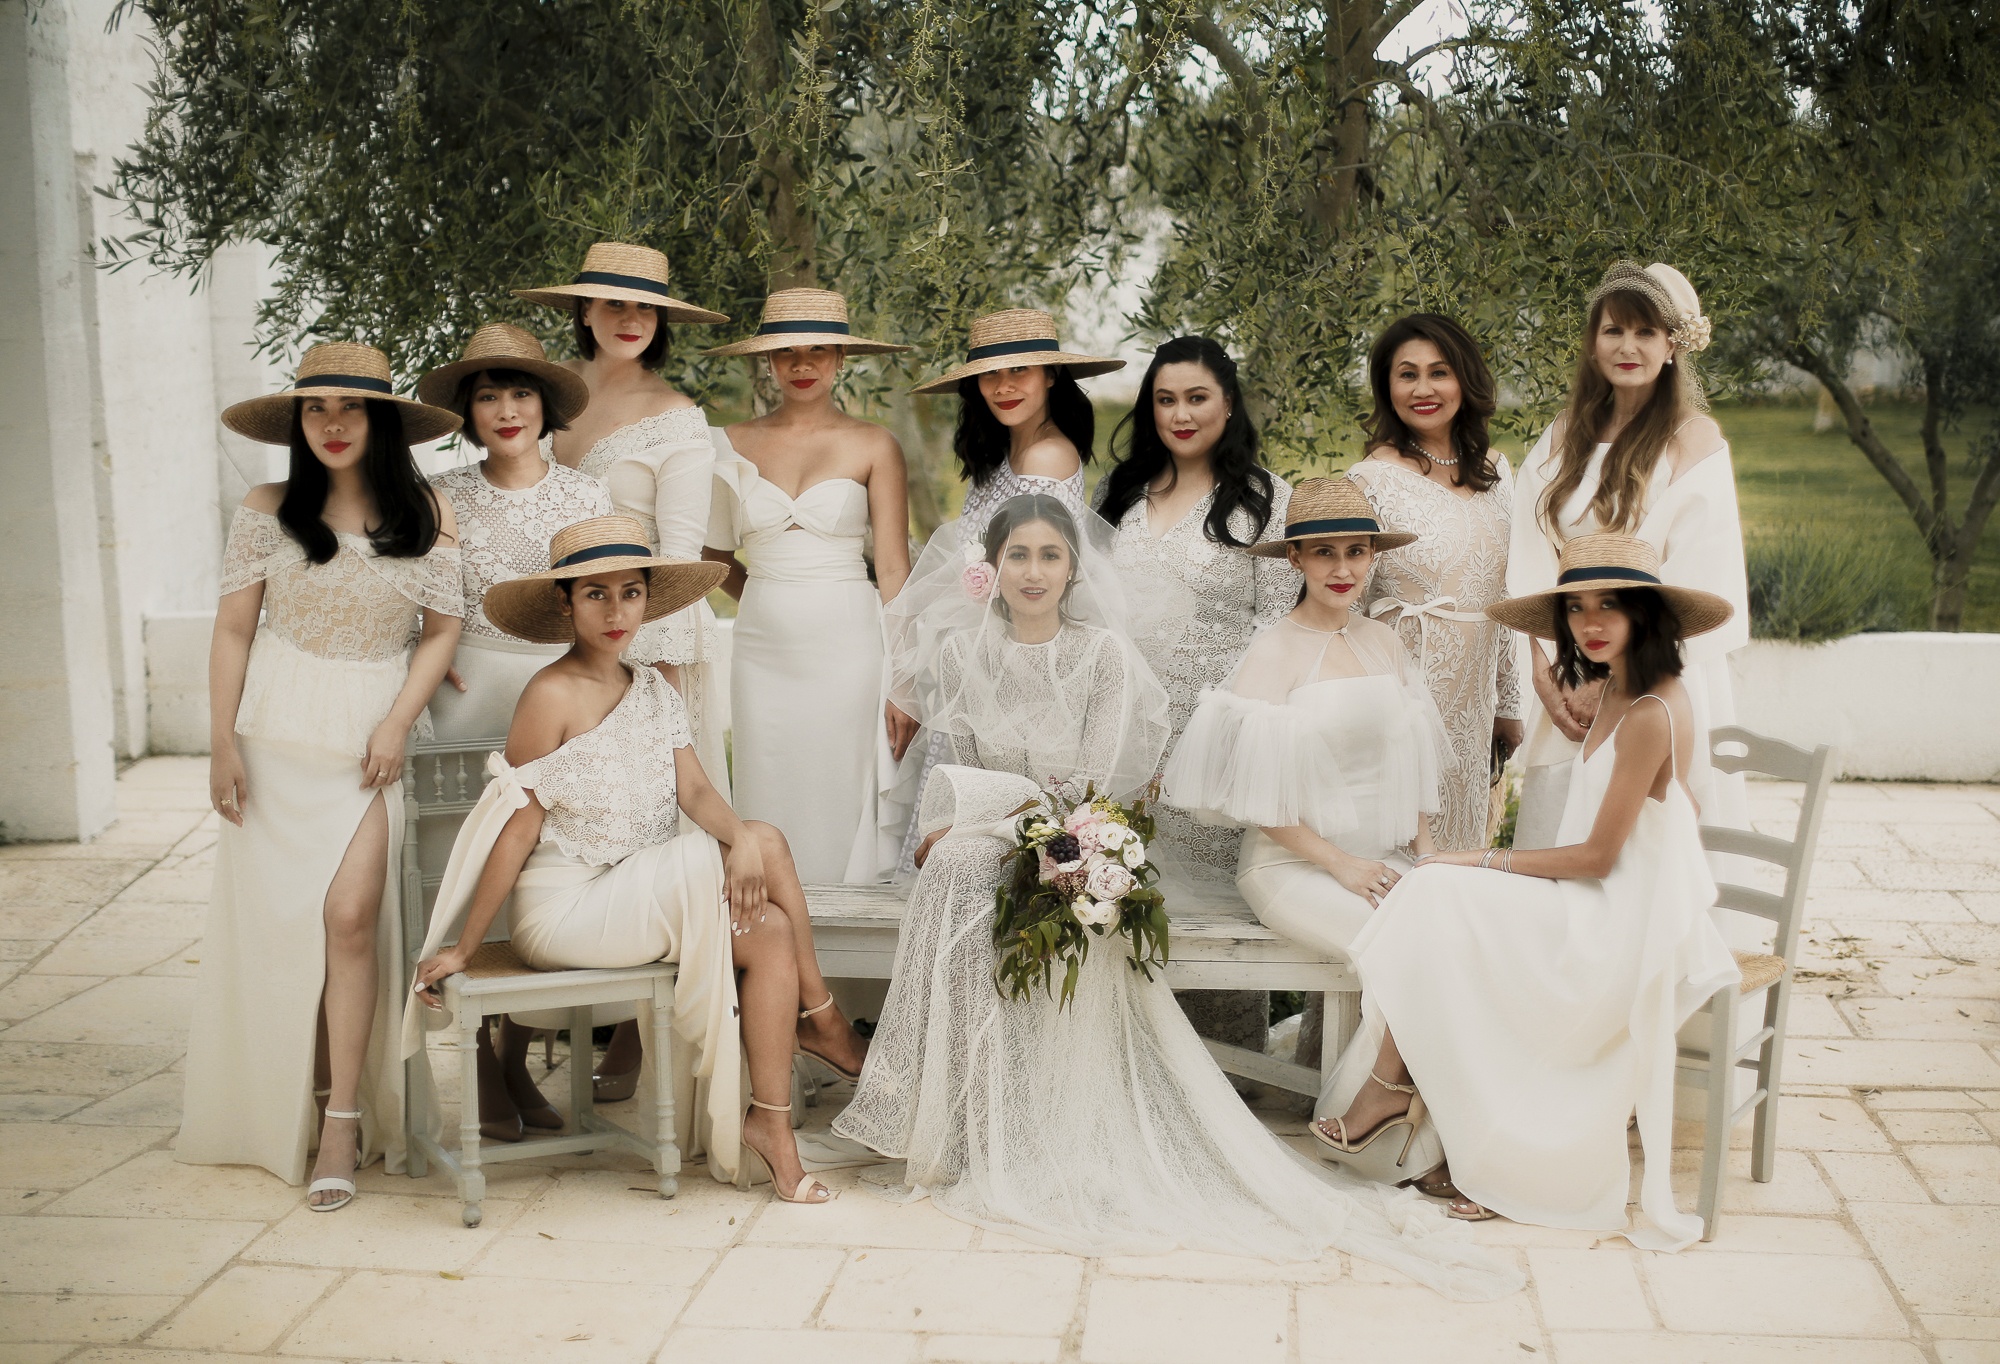 The Bridestory Blog's 17 Most Favorite Real Weddings of 2017 Image 15